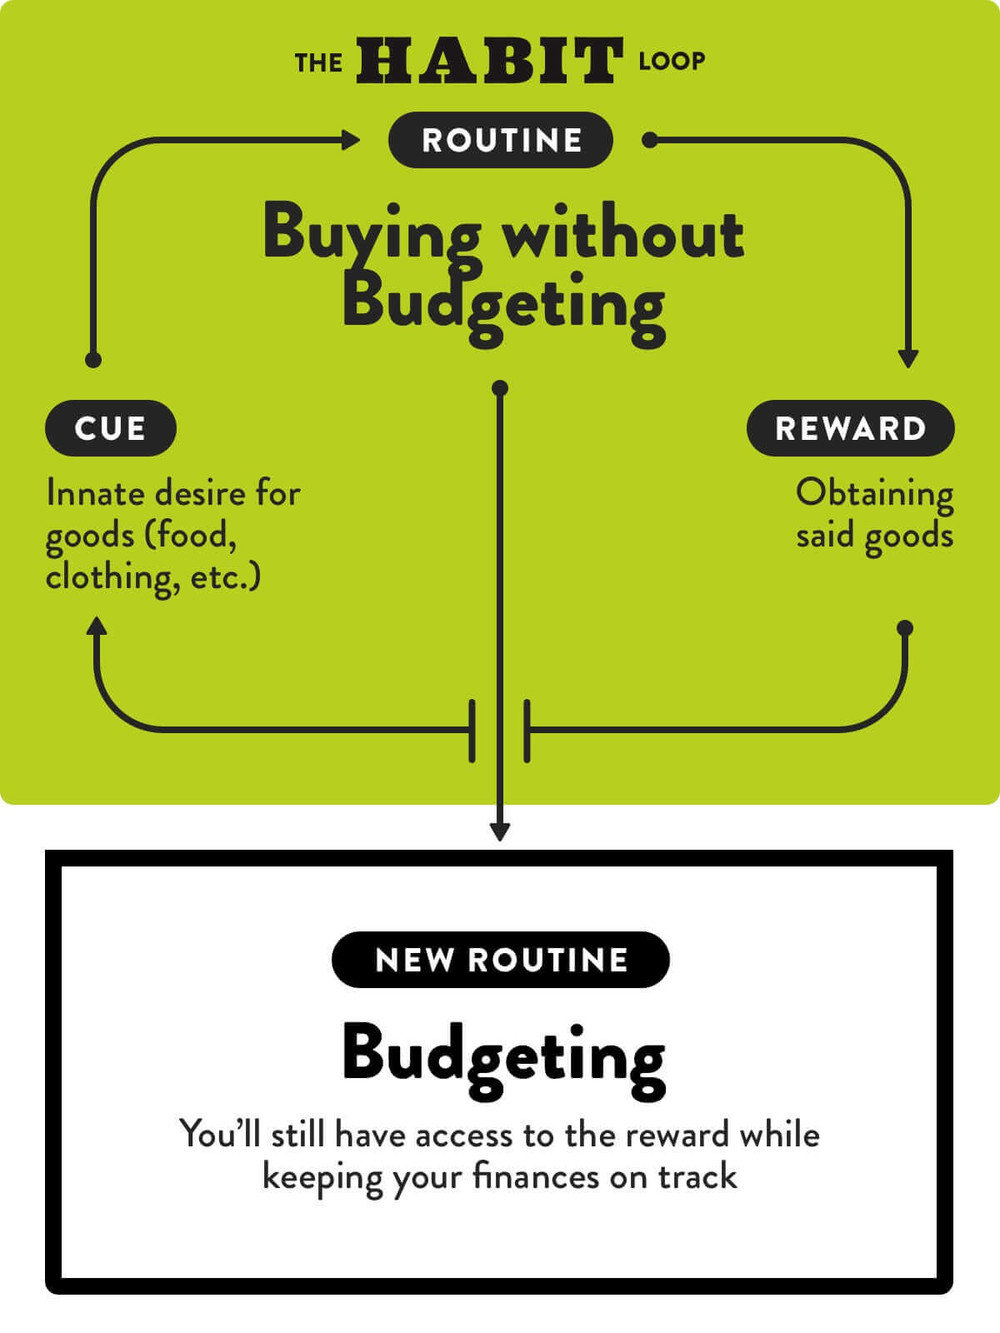 buying without budgeting habit loop